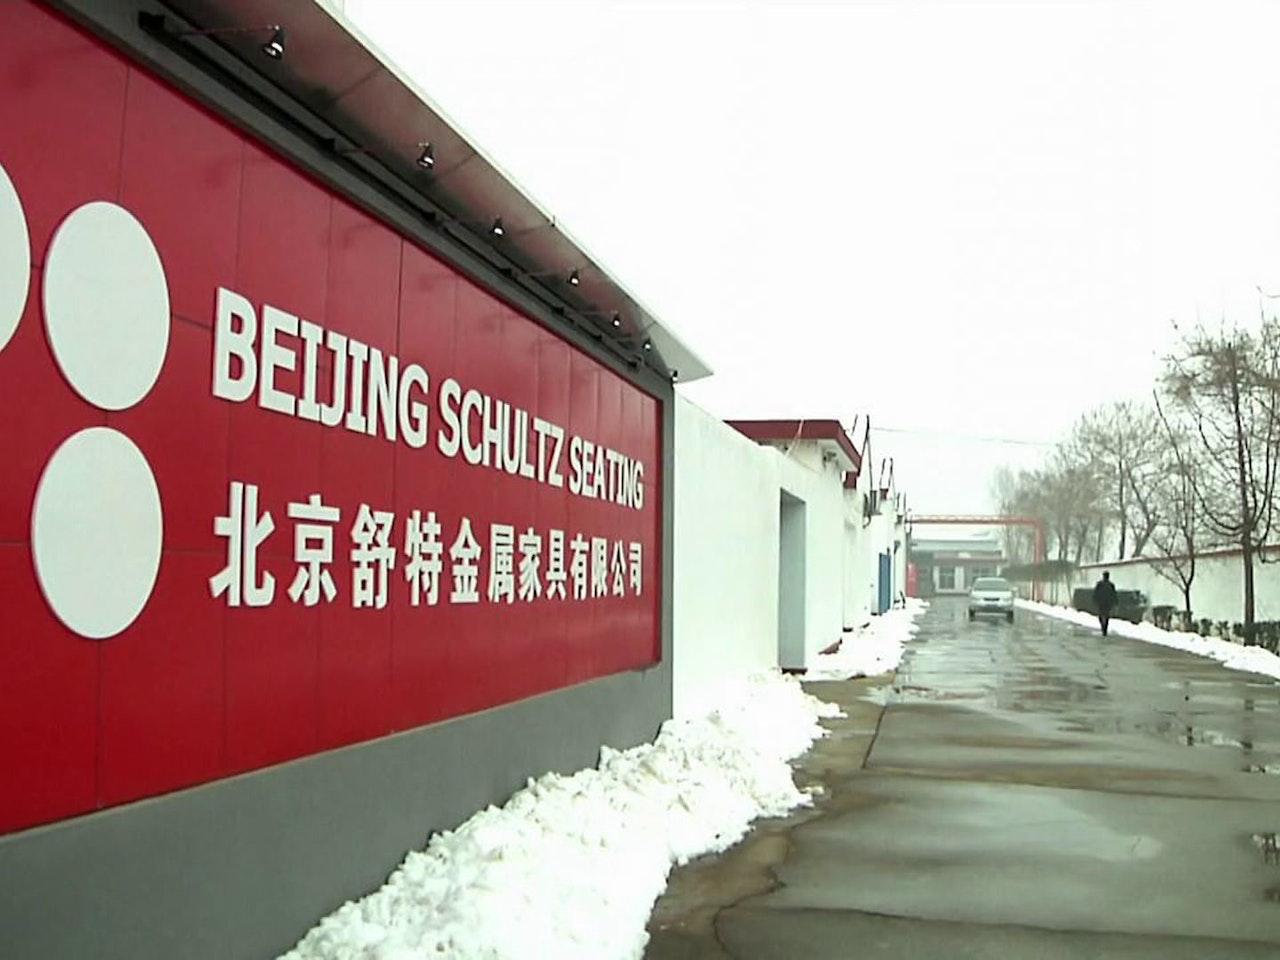 Beijing Schultz Seating, subtitled